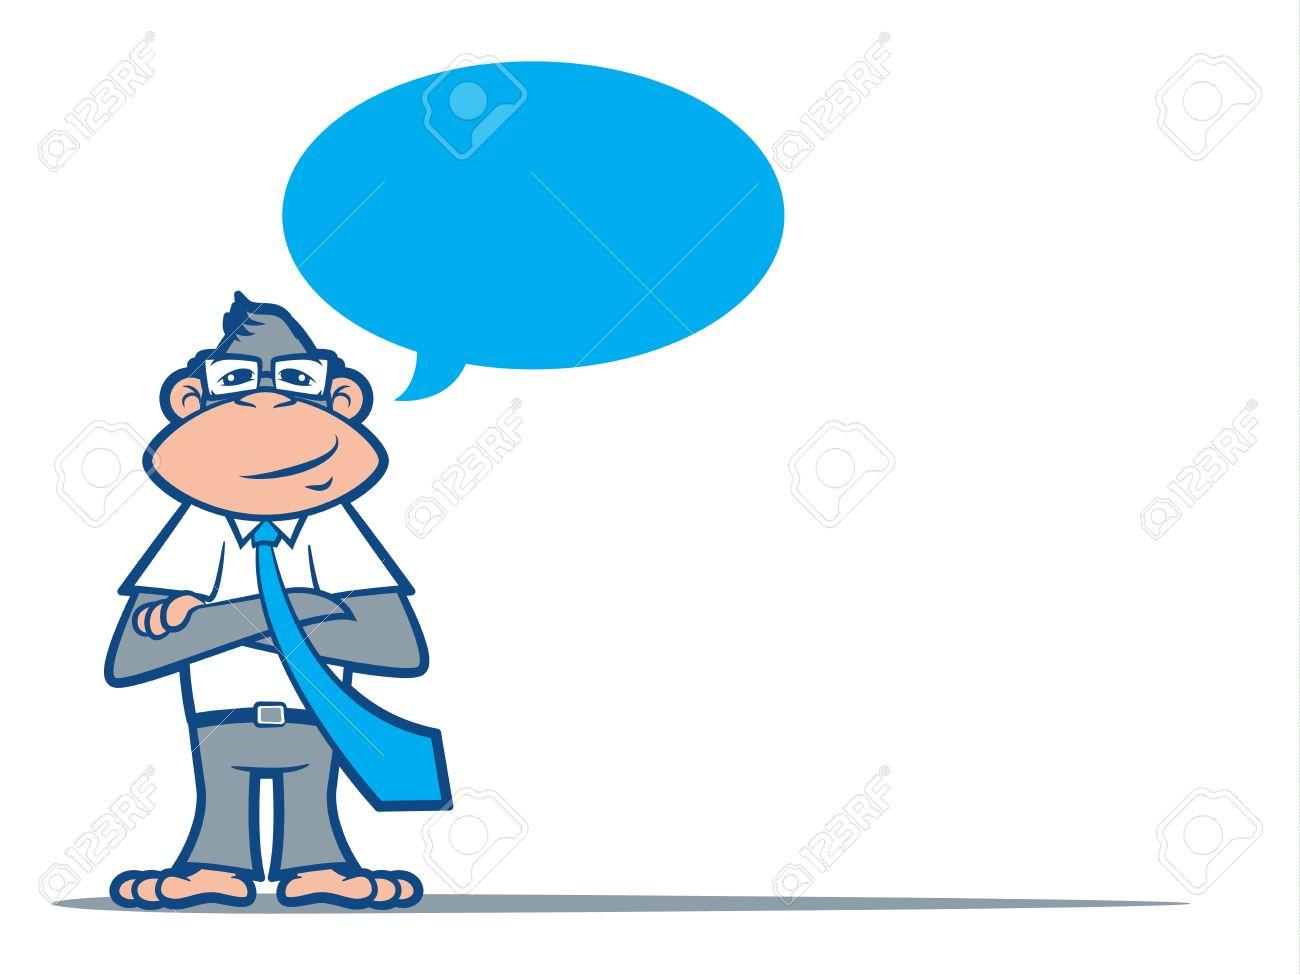 Cartoon Monkey Nerd Wearing A Tie And Talking Stock Vector  21674865